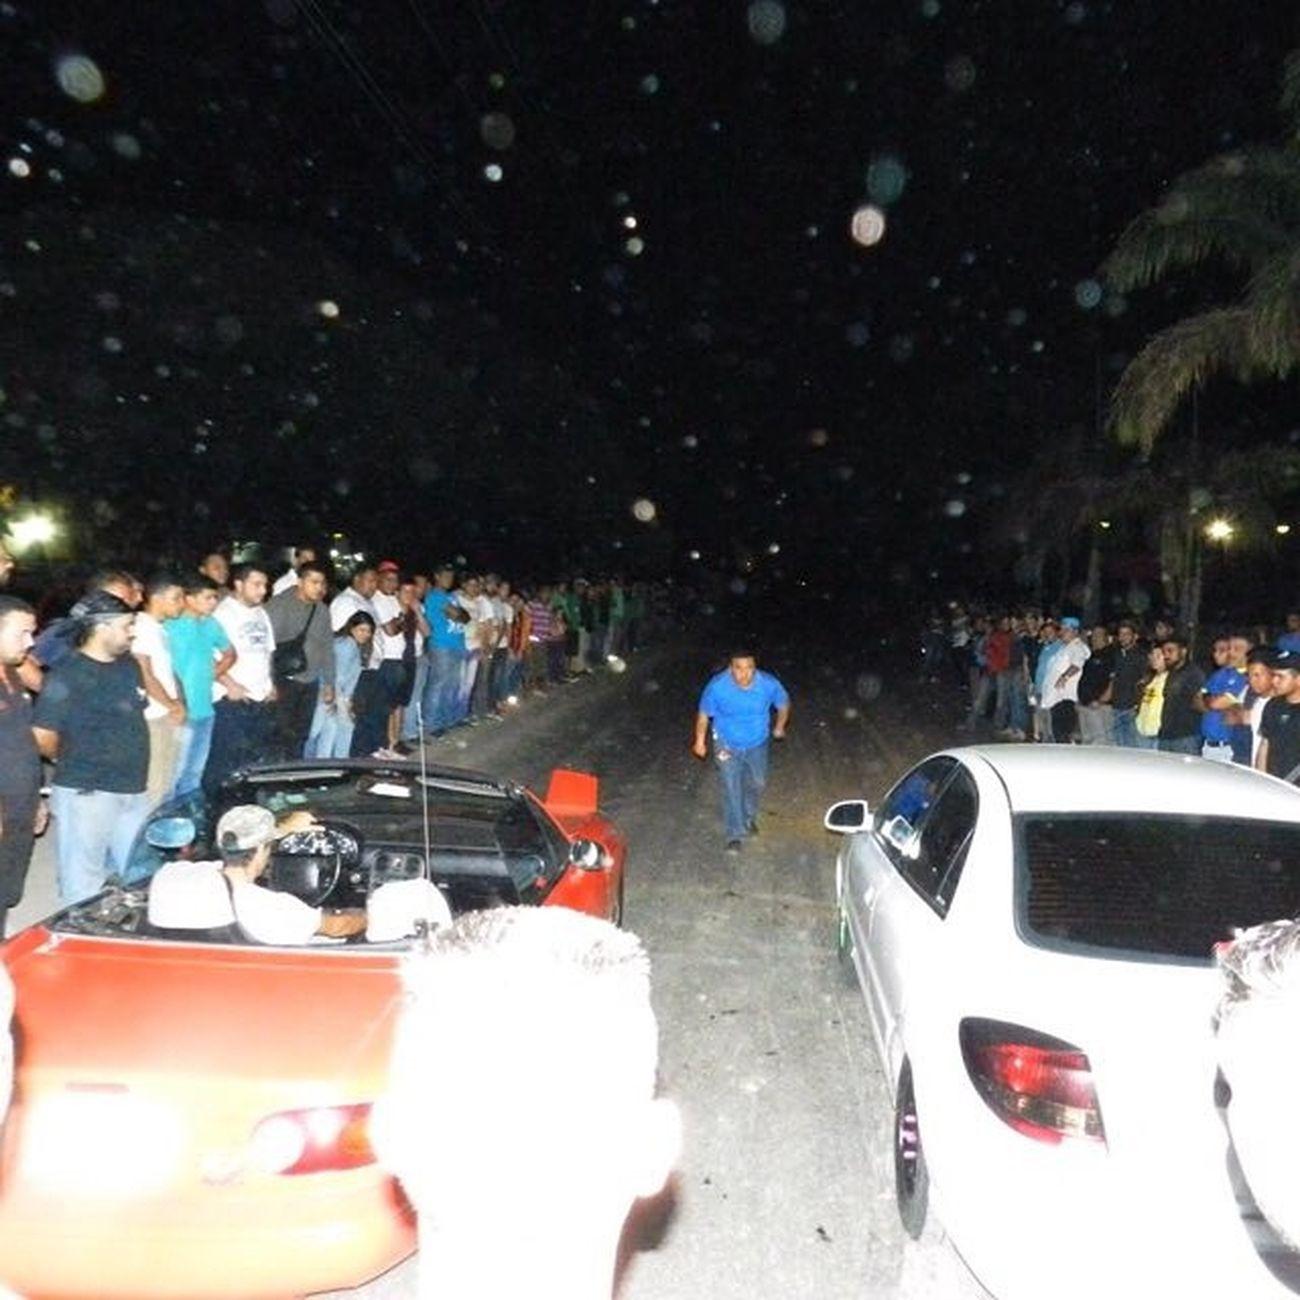 Noche Dragster En La Zona De Combates con @lazcano118 Dragster Night Draglife DragStreet Piques Mazdamiata Kia KiaRio Racing Combat Barquisighetto Venezuela Lara